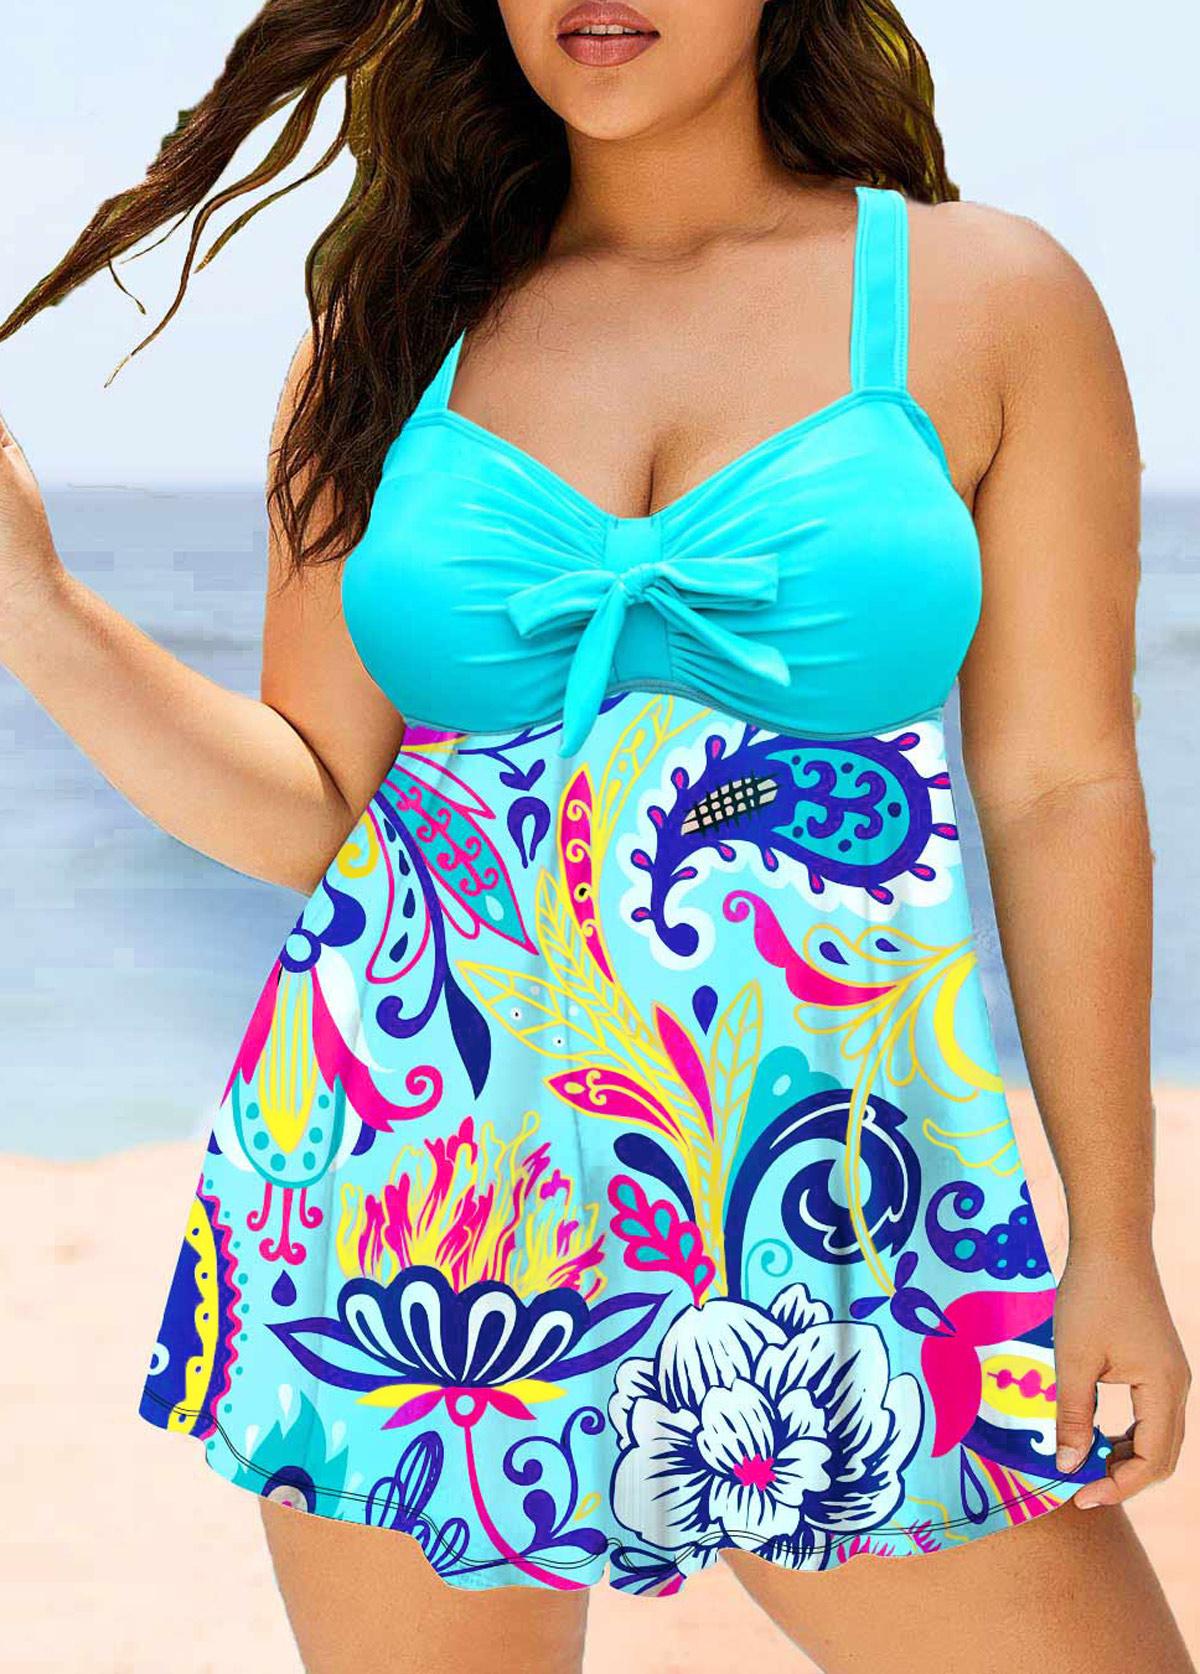 Printed Bowknot Plus Size Swimwear Top